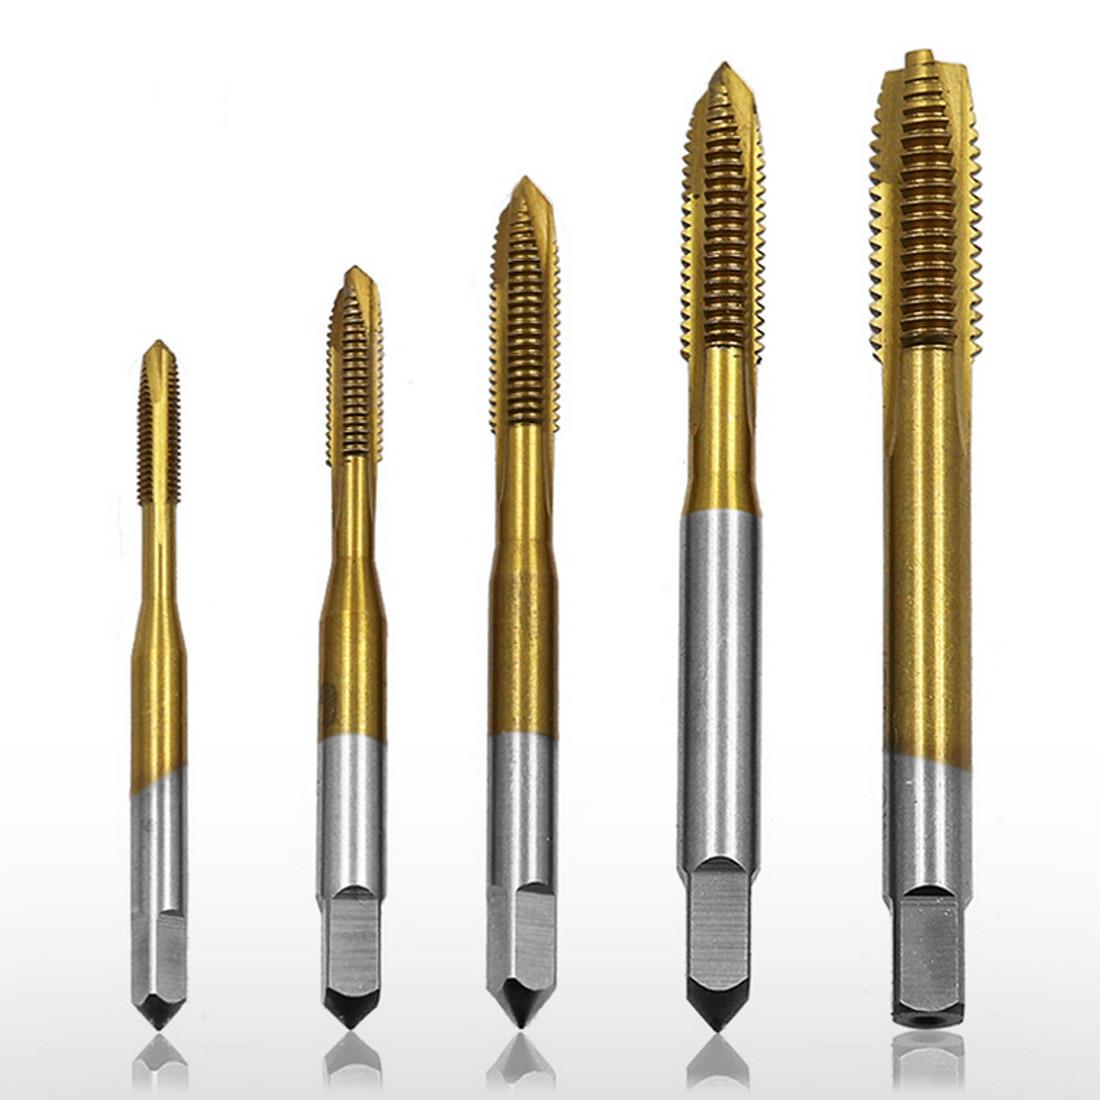 Titanium Coated Thread Tap Drill Metric Hss Spiral Fluted Machine Screw Tap M3 M4 M5 M6 M8 Spiral Pointed Taps